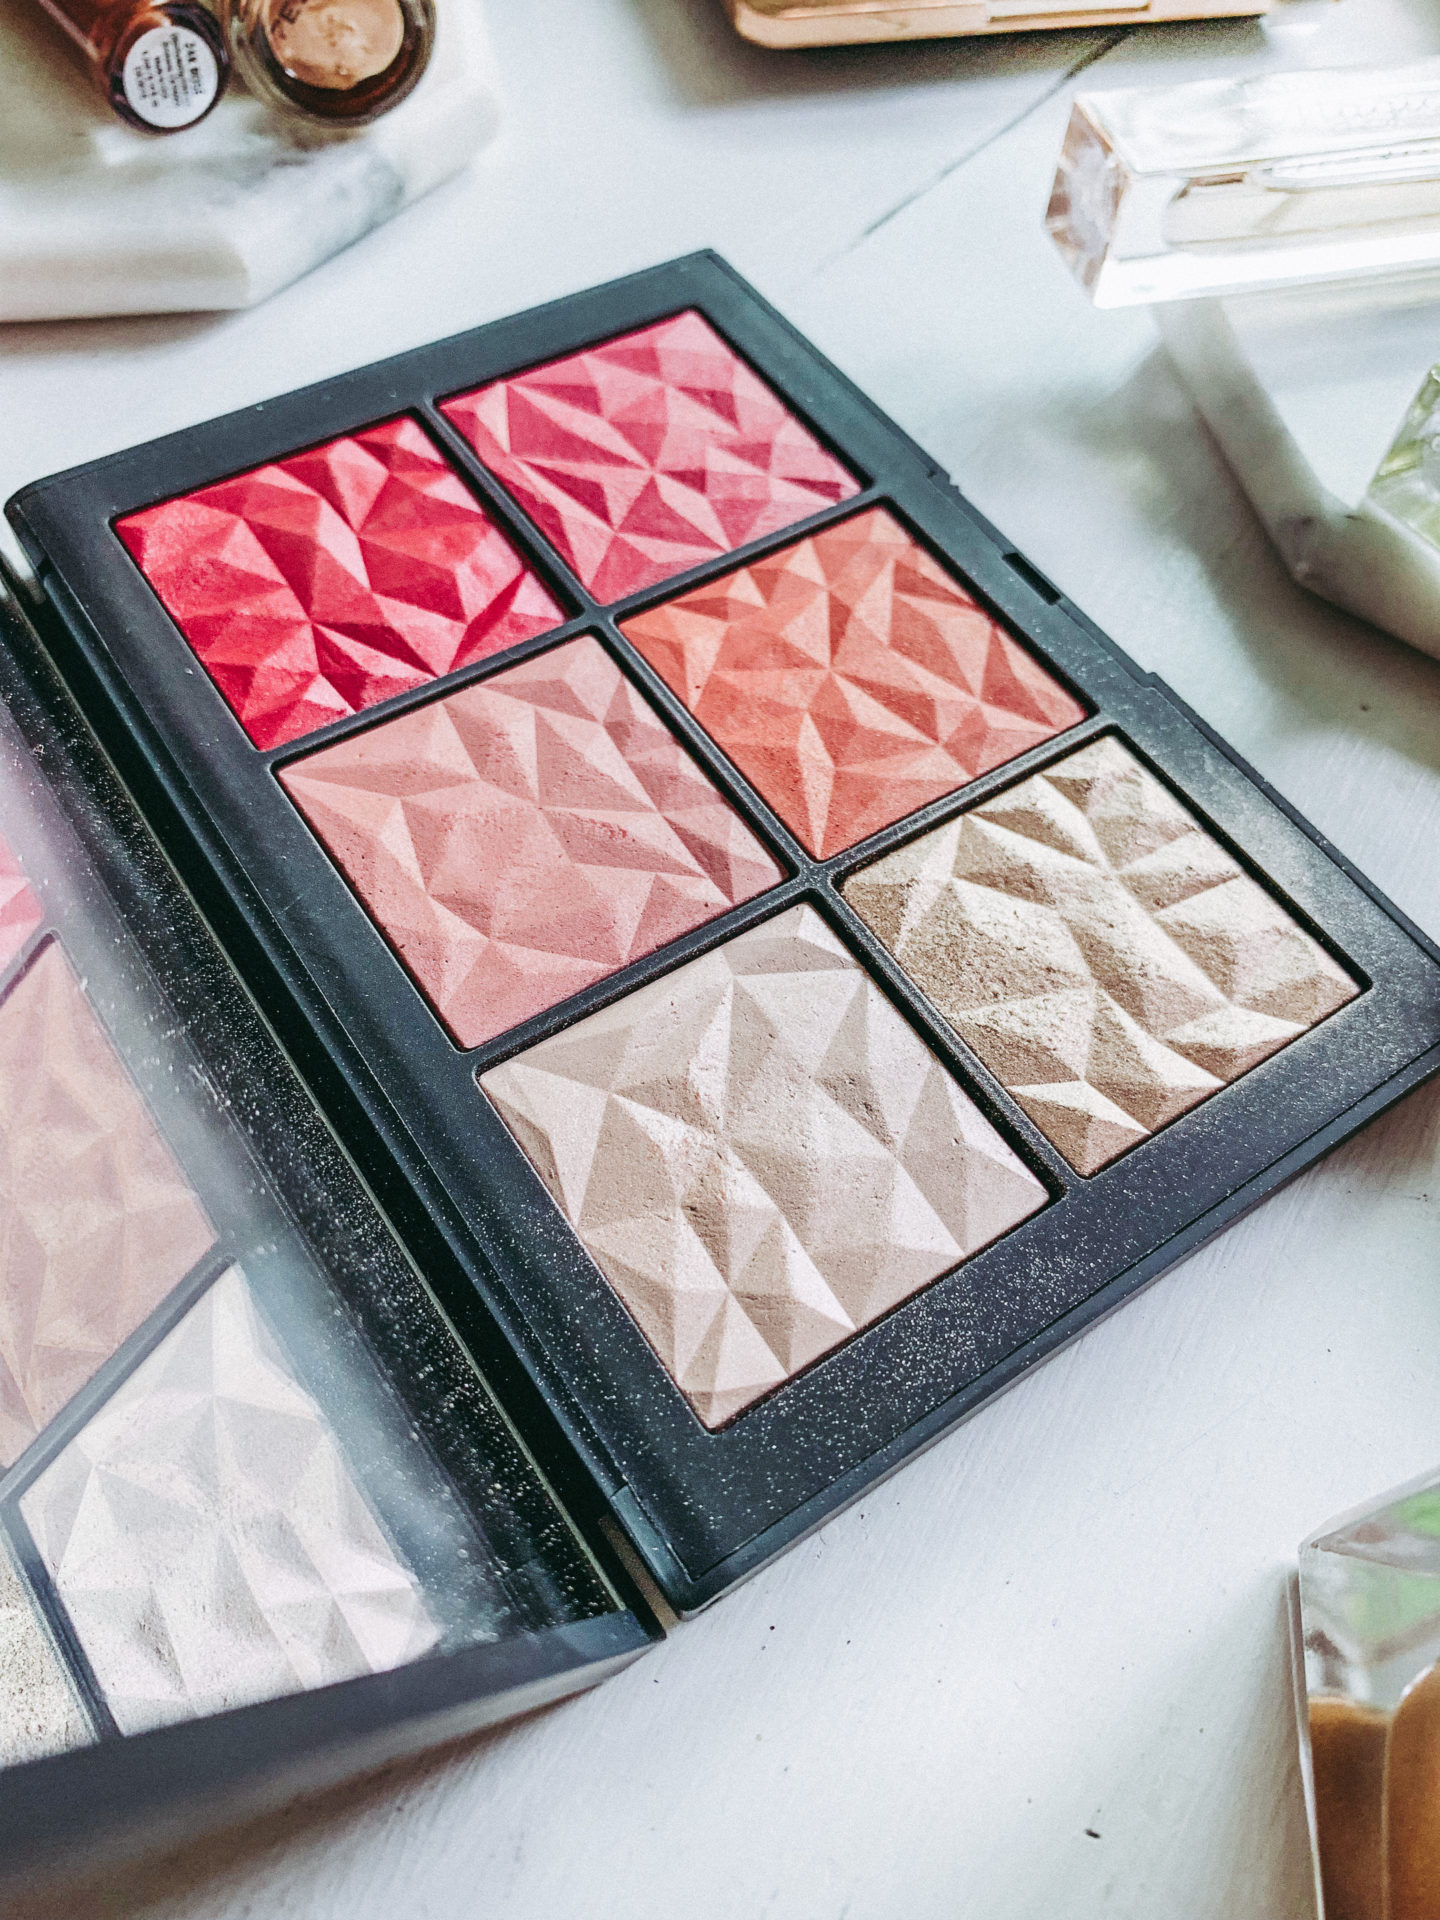 Latest Luxury Beauty Favorites NARS Tryst Palette